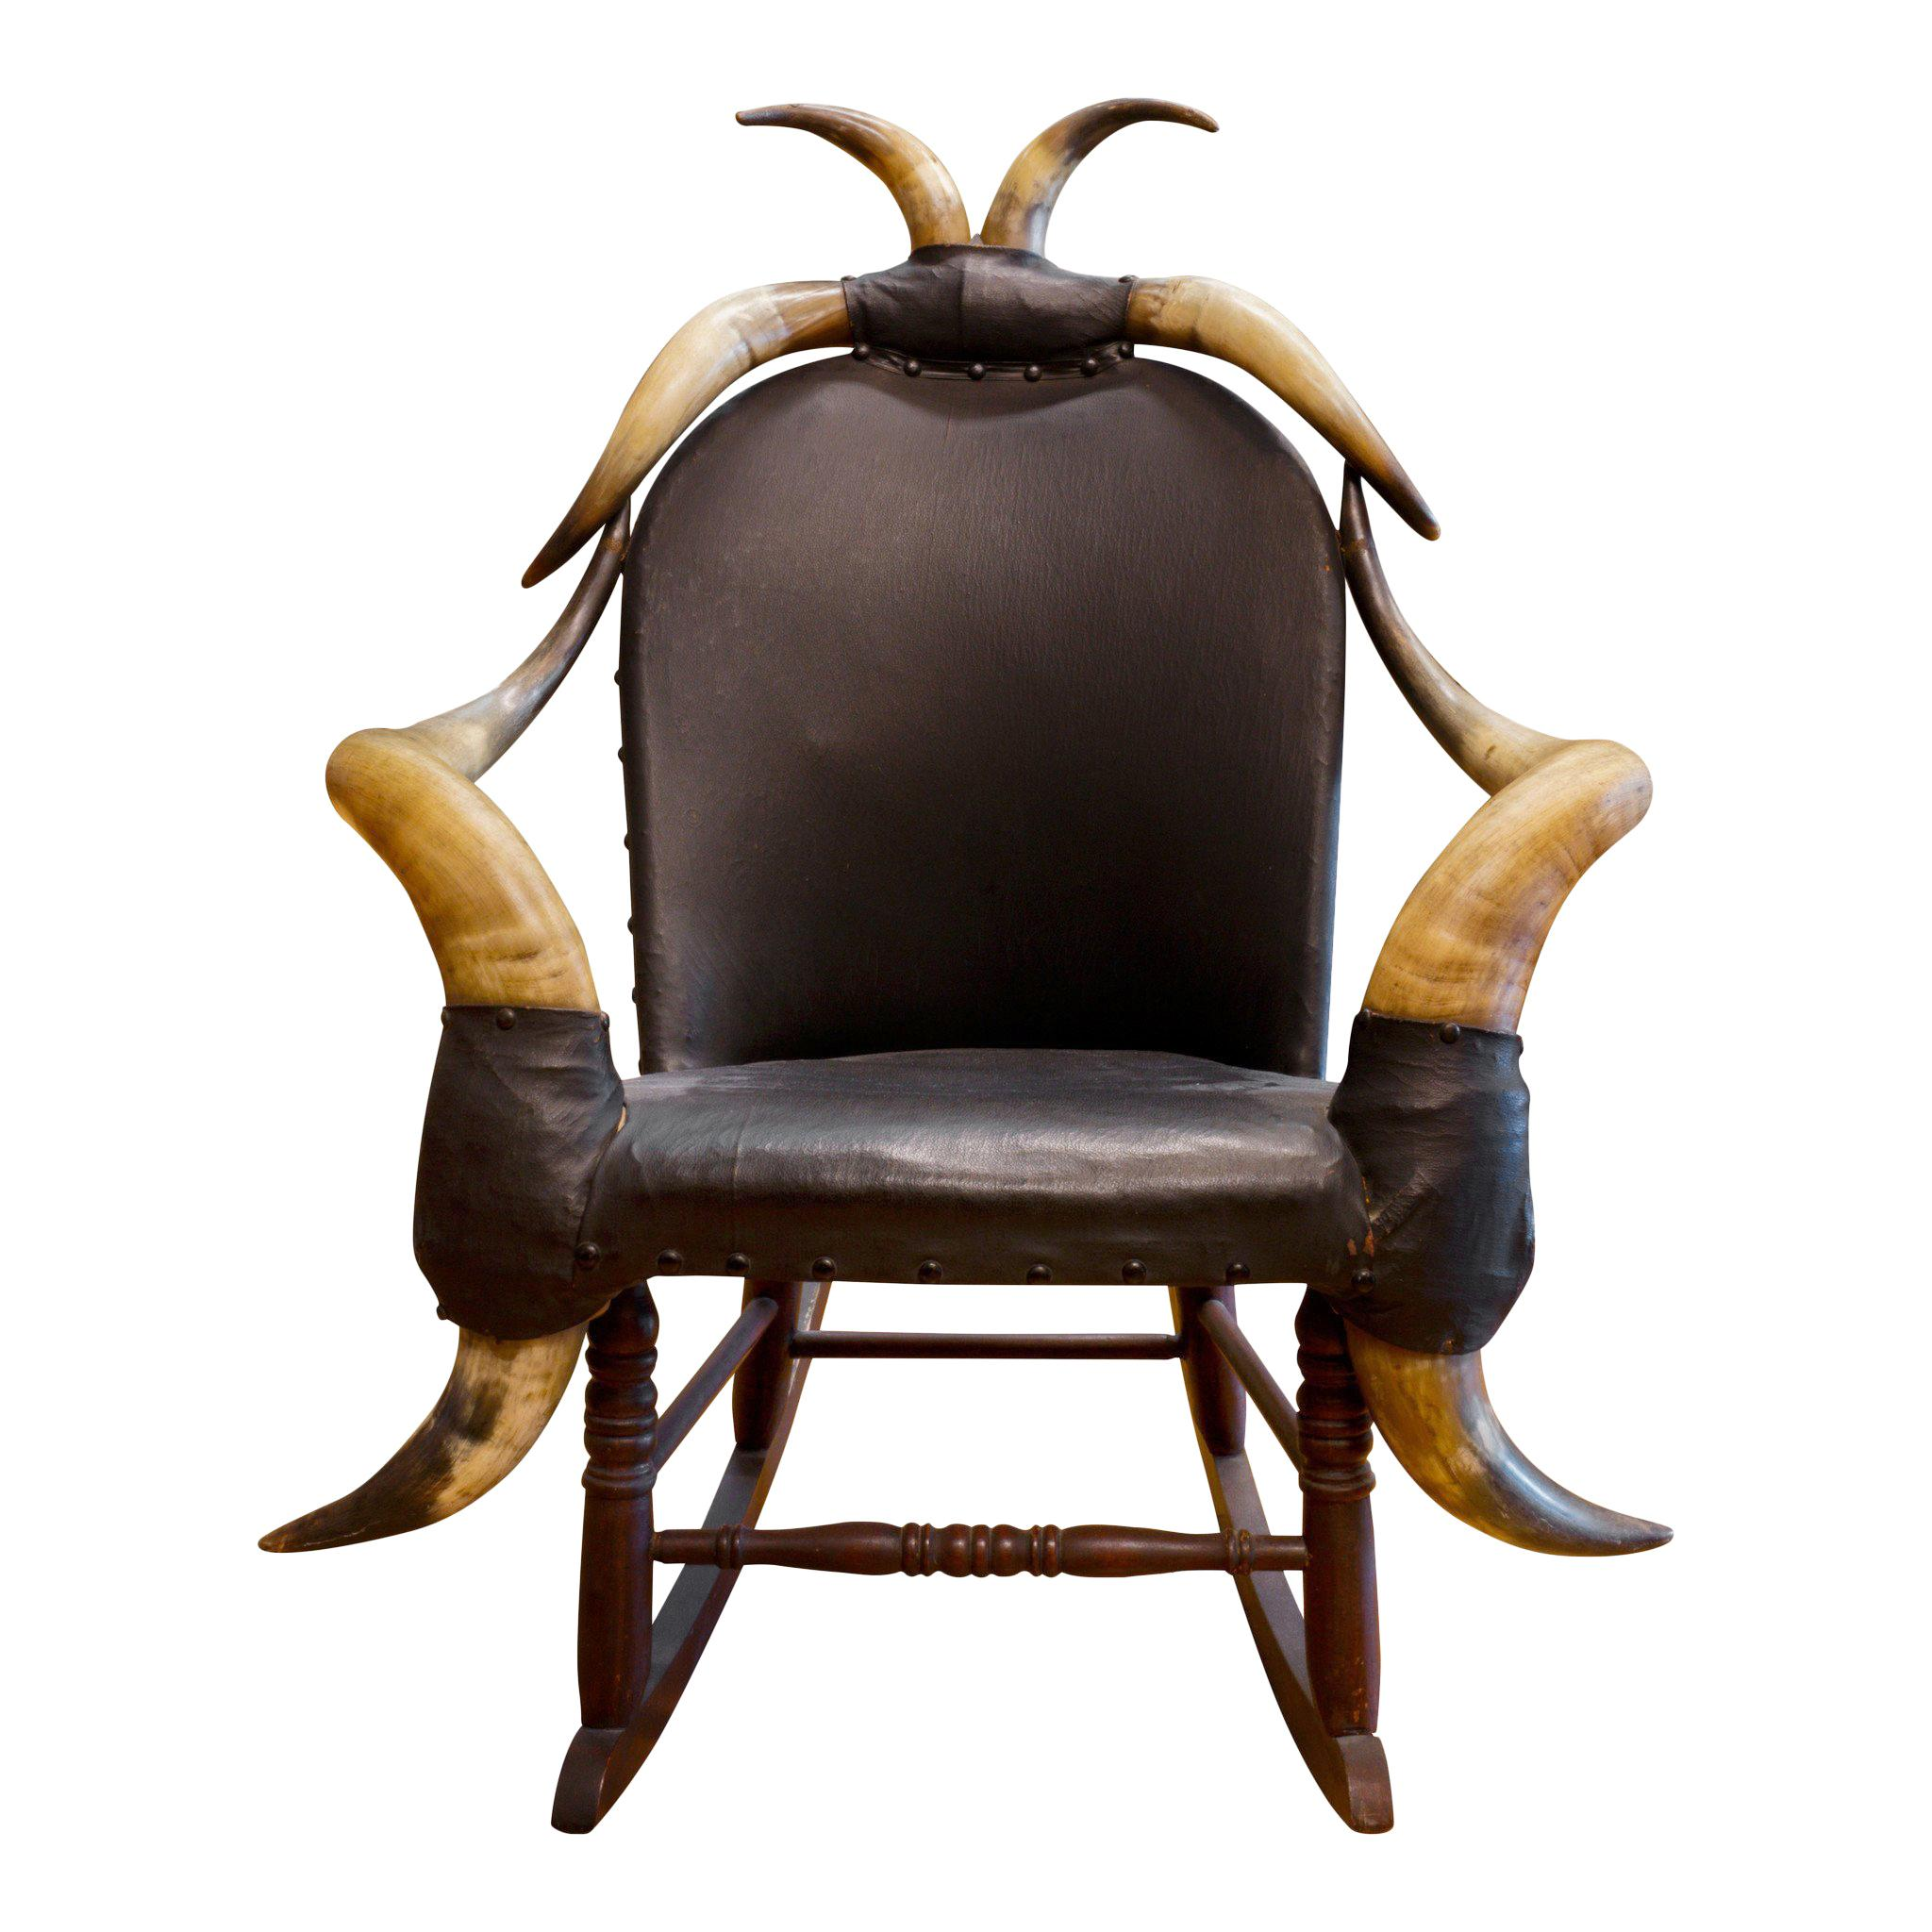 19th Century Eight Horn Rocking Chair